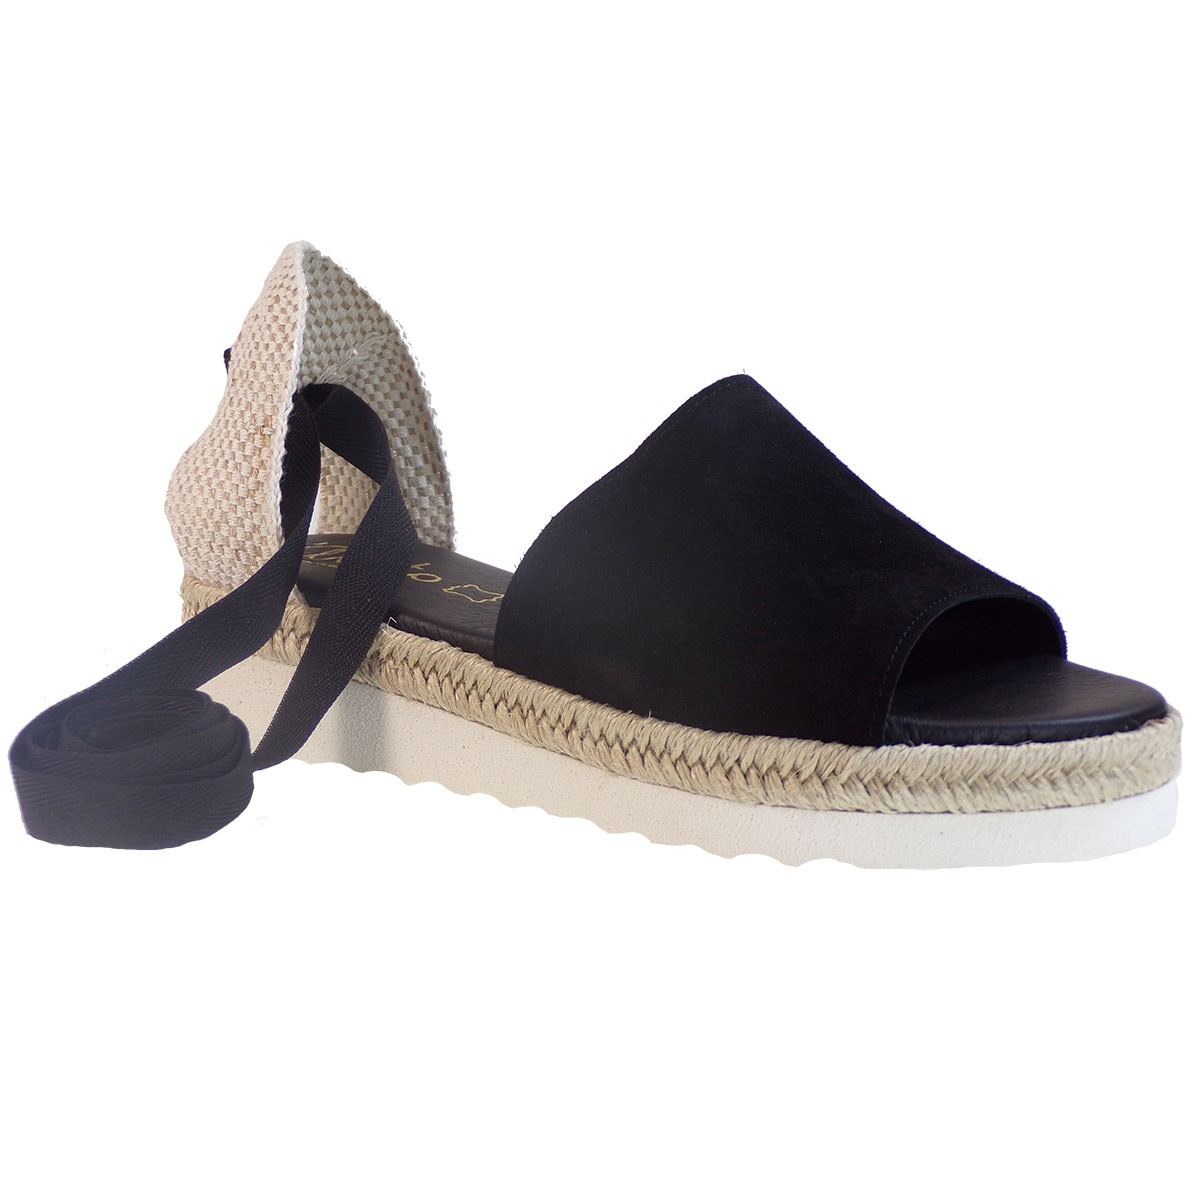 Katia Shoes Anneto Γυναικείες Εσπαντρίγιες Κ159-P Μαύρο